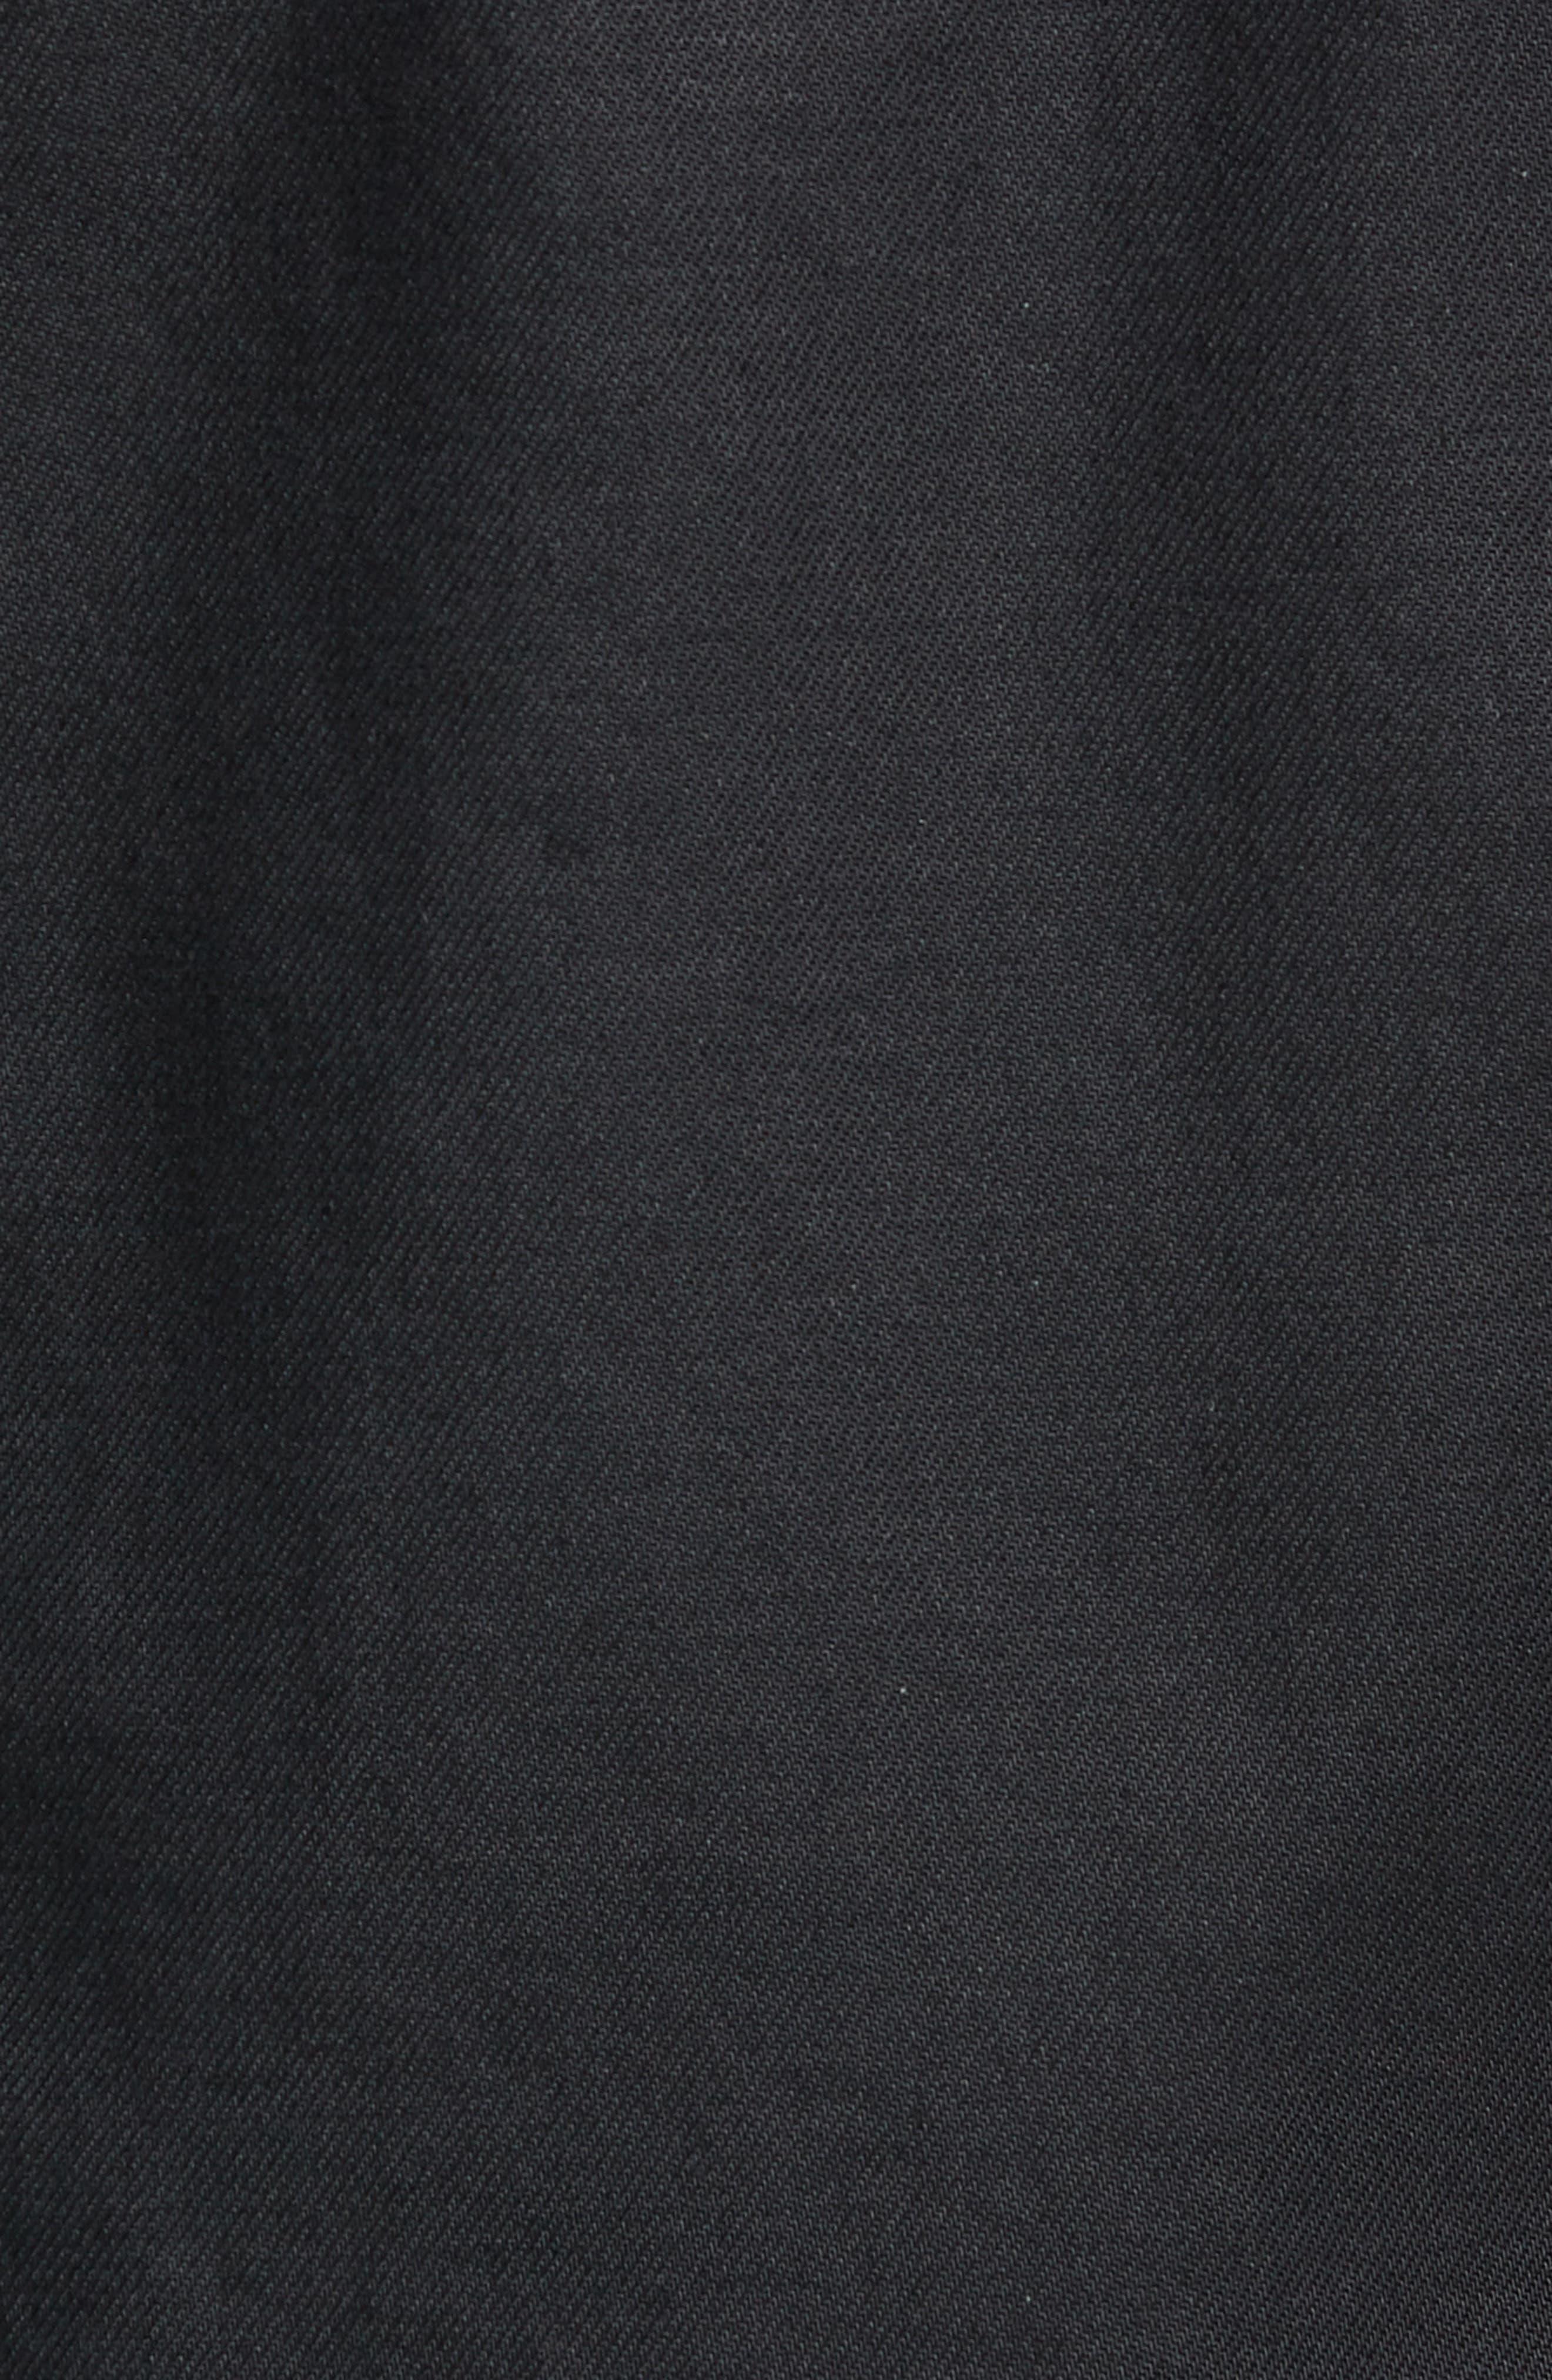 HUDSON JEANS, Zip Denim Jacket, Alternate thumbnail 6, color, ONYX